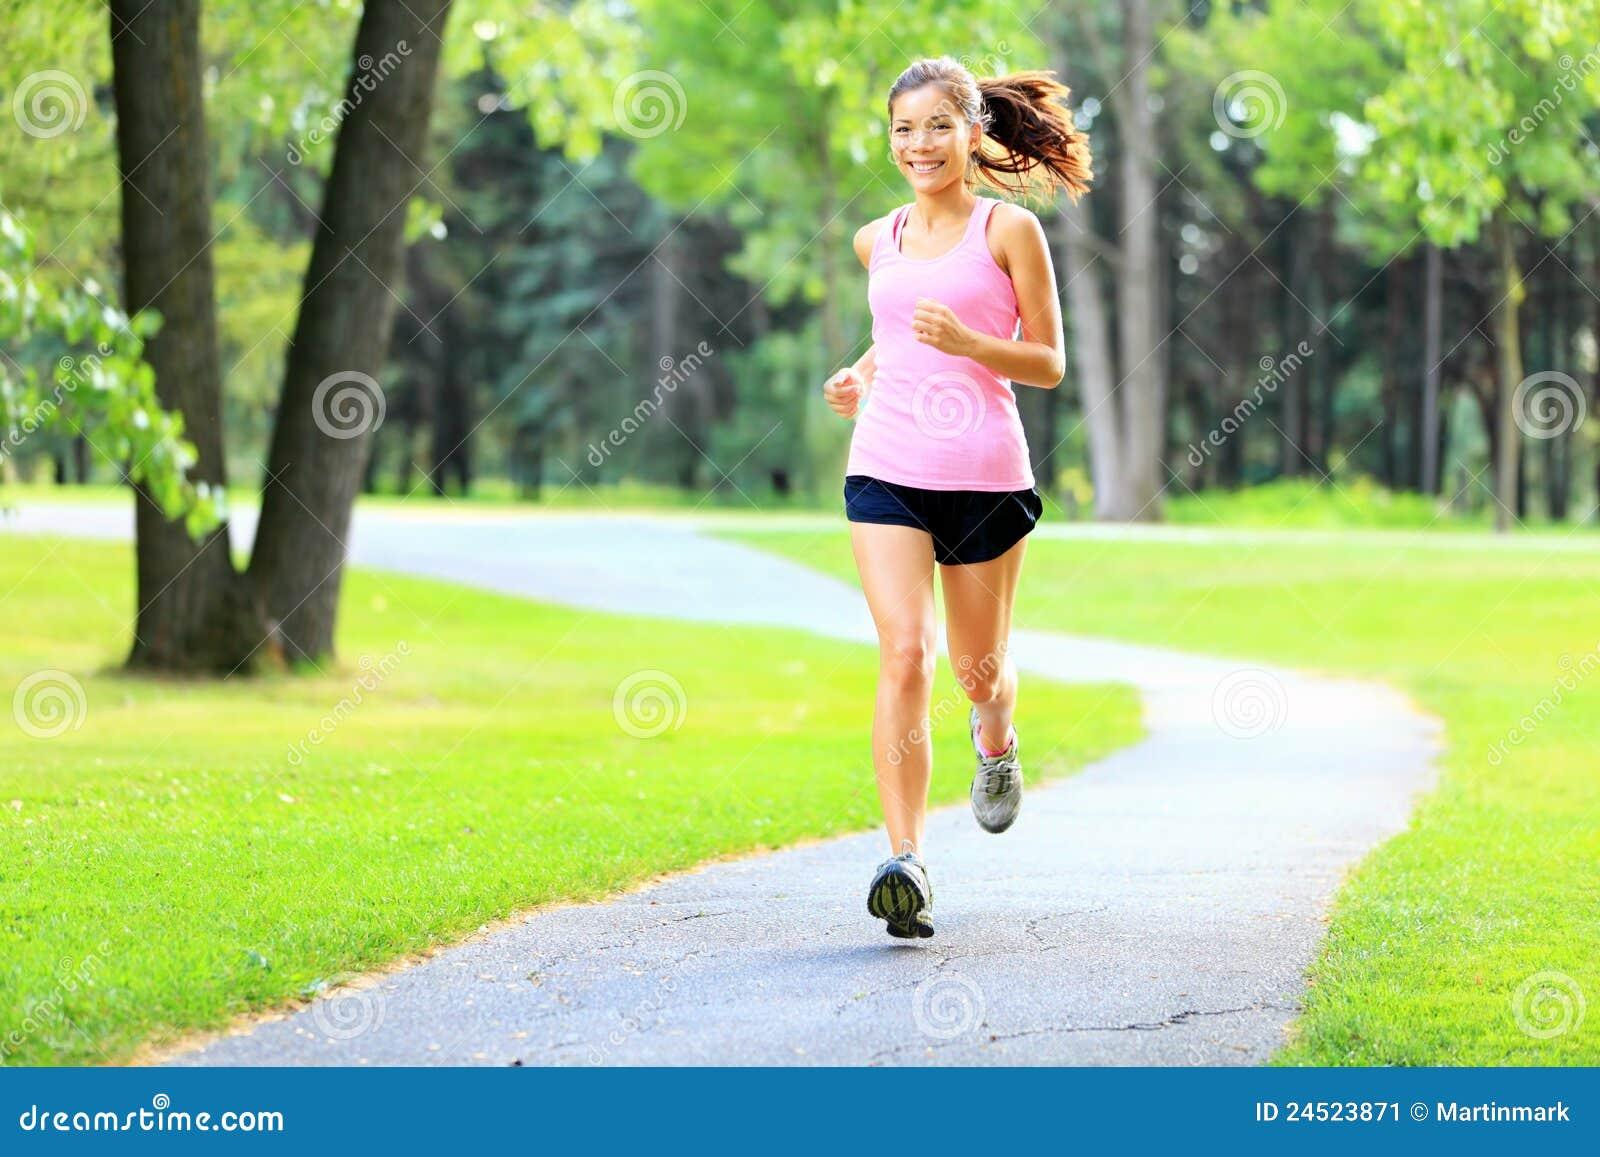 Laufende Frau im Park